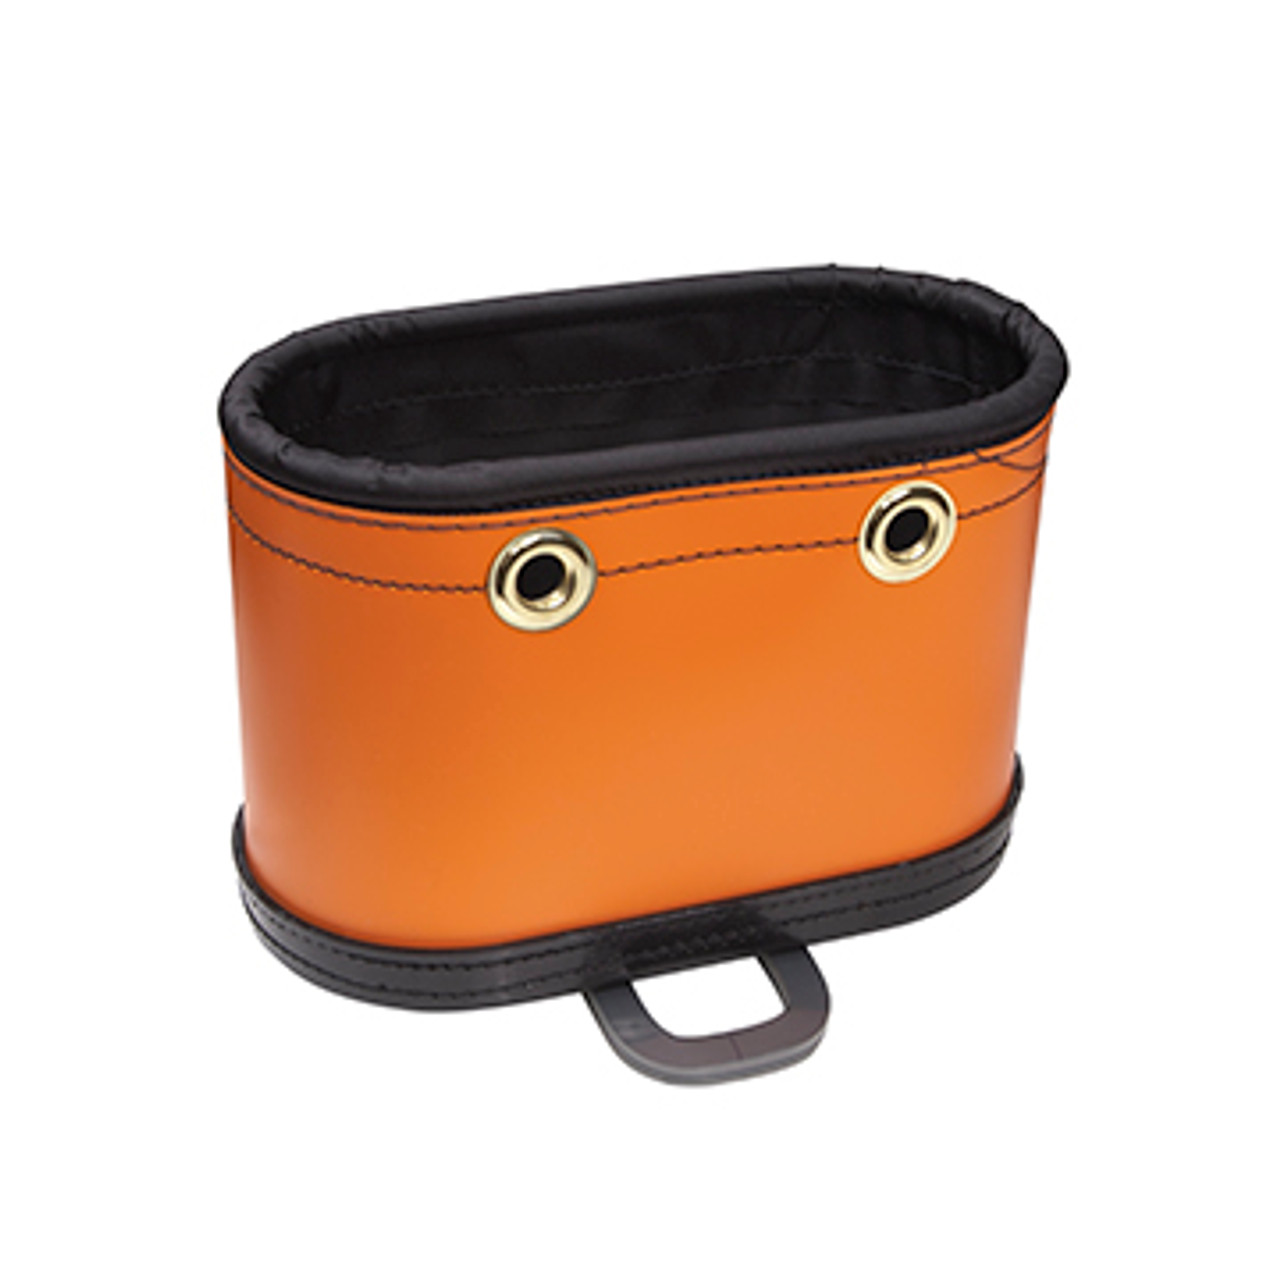 5144BHB Hard Body KIck Stand Oval Bucket